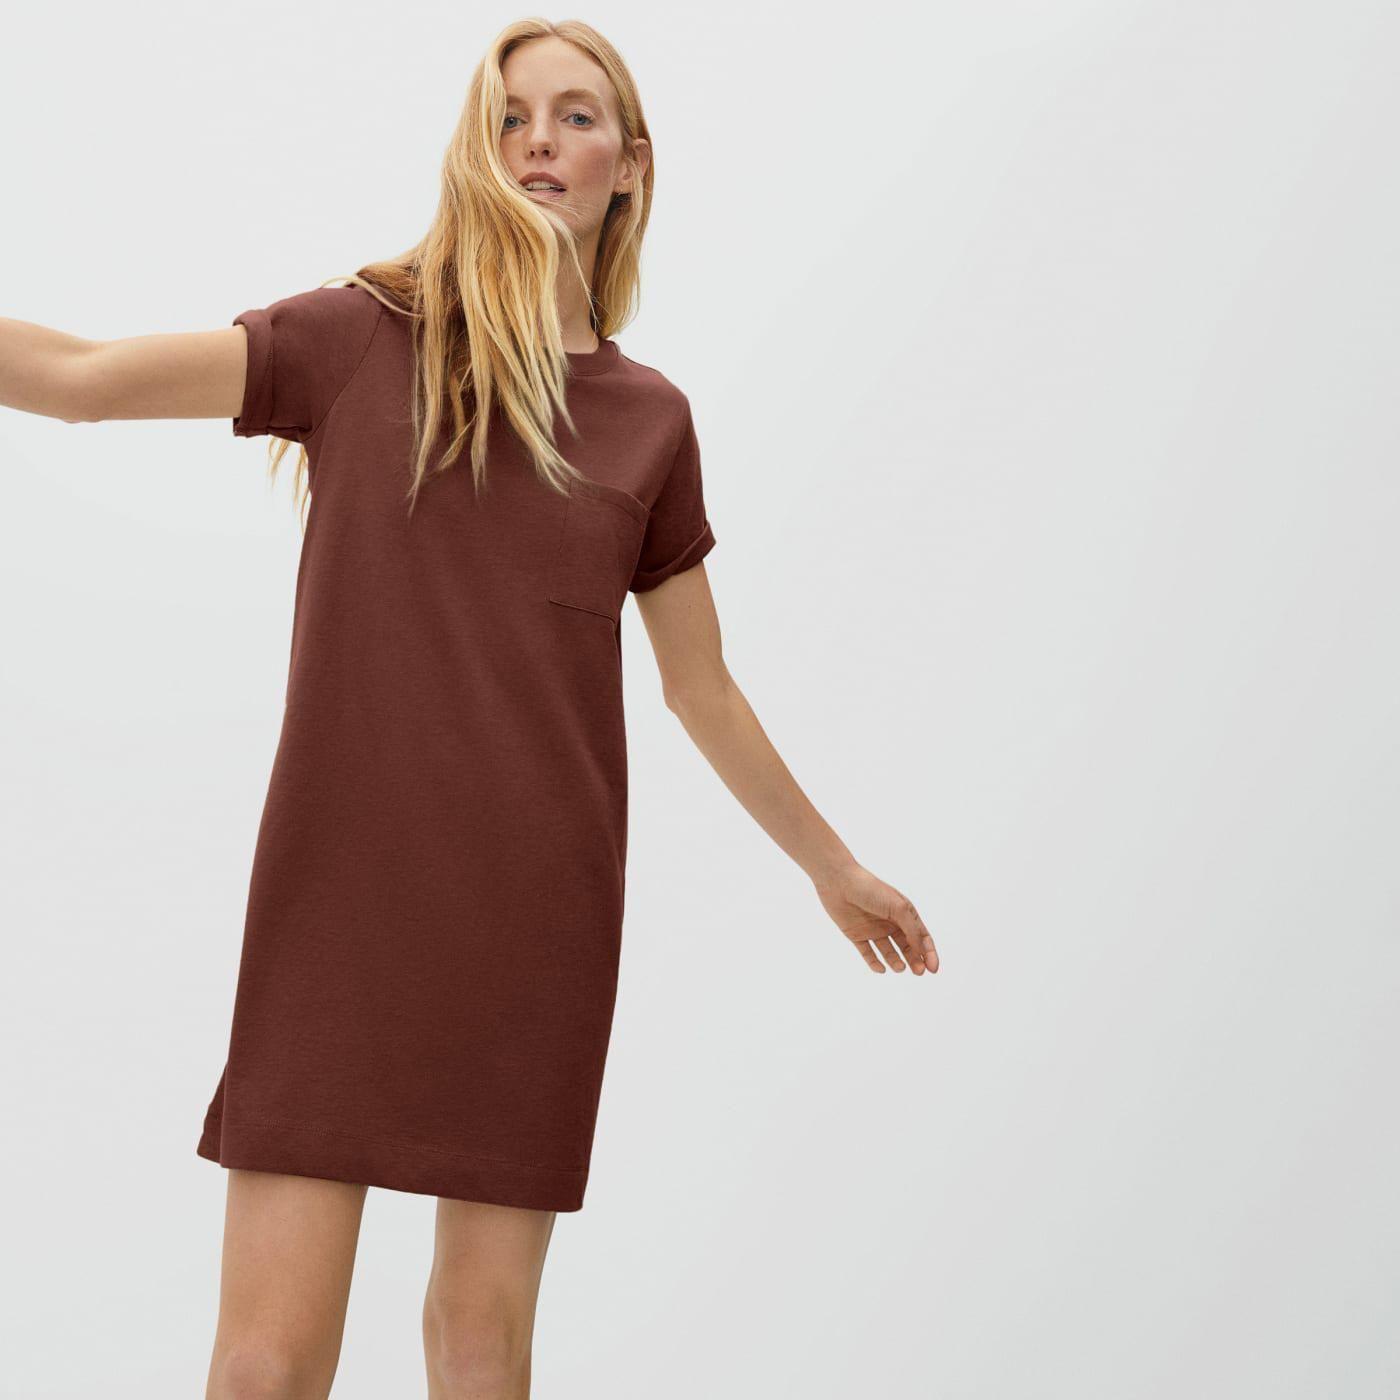 The Weekend Tee Dress